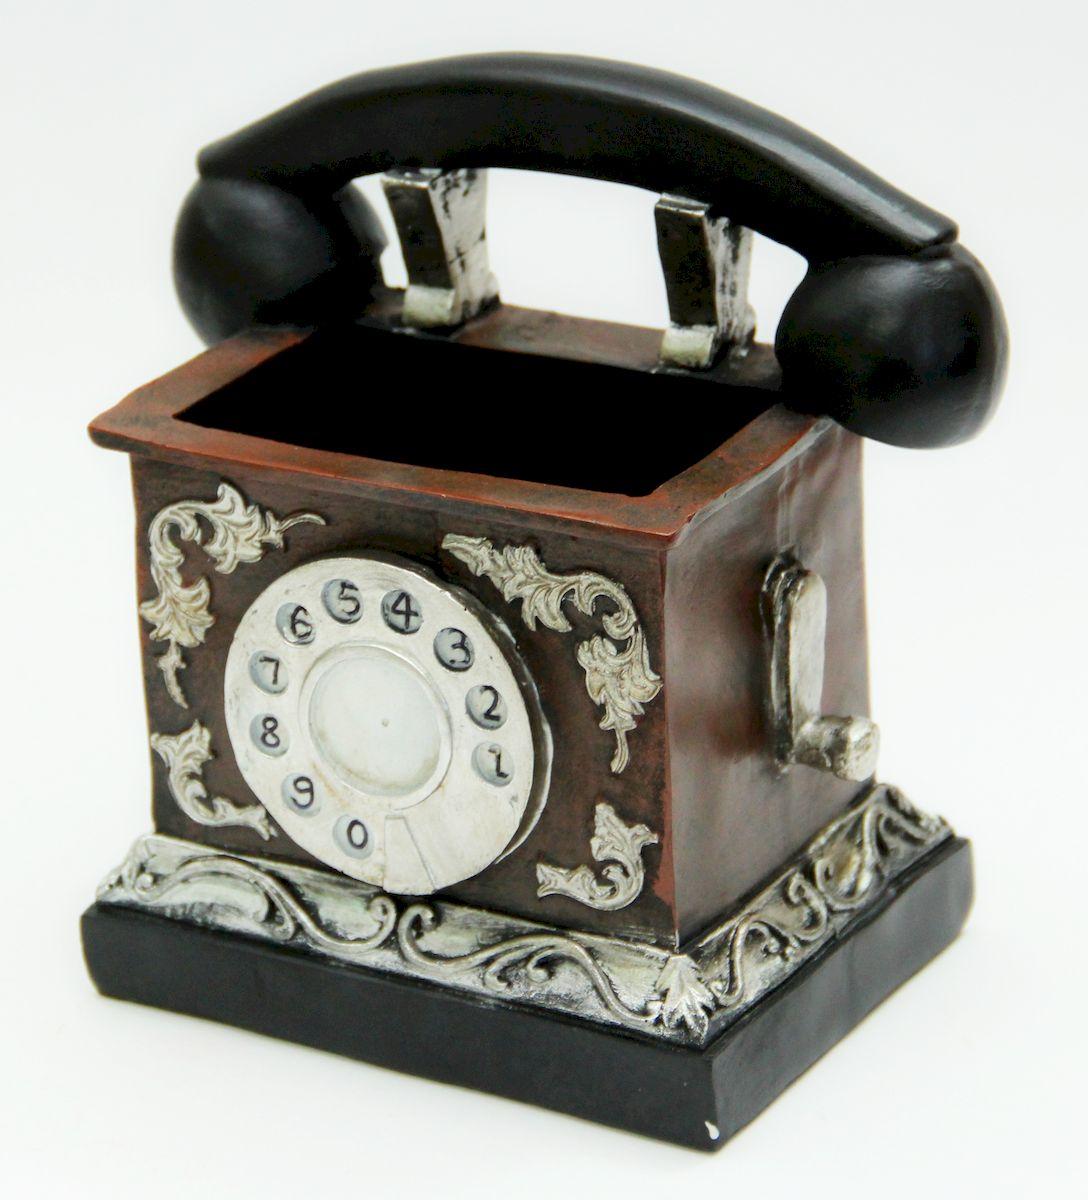 Декоративная подставка для канцелярских принадлежностей Magic Home Ретро телефон. 3613236132